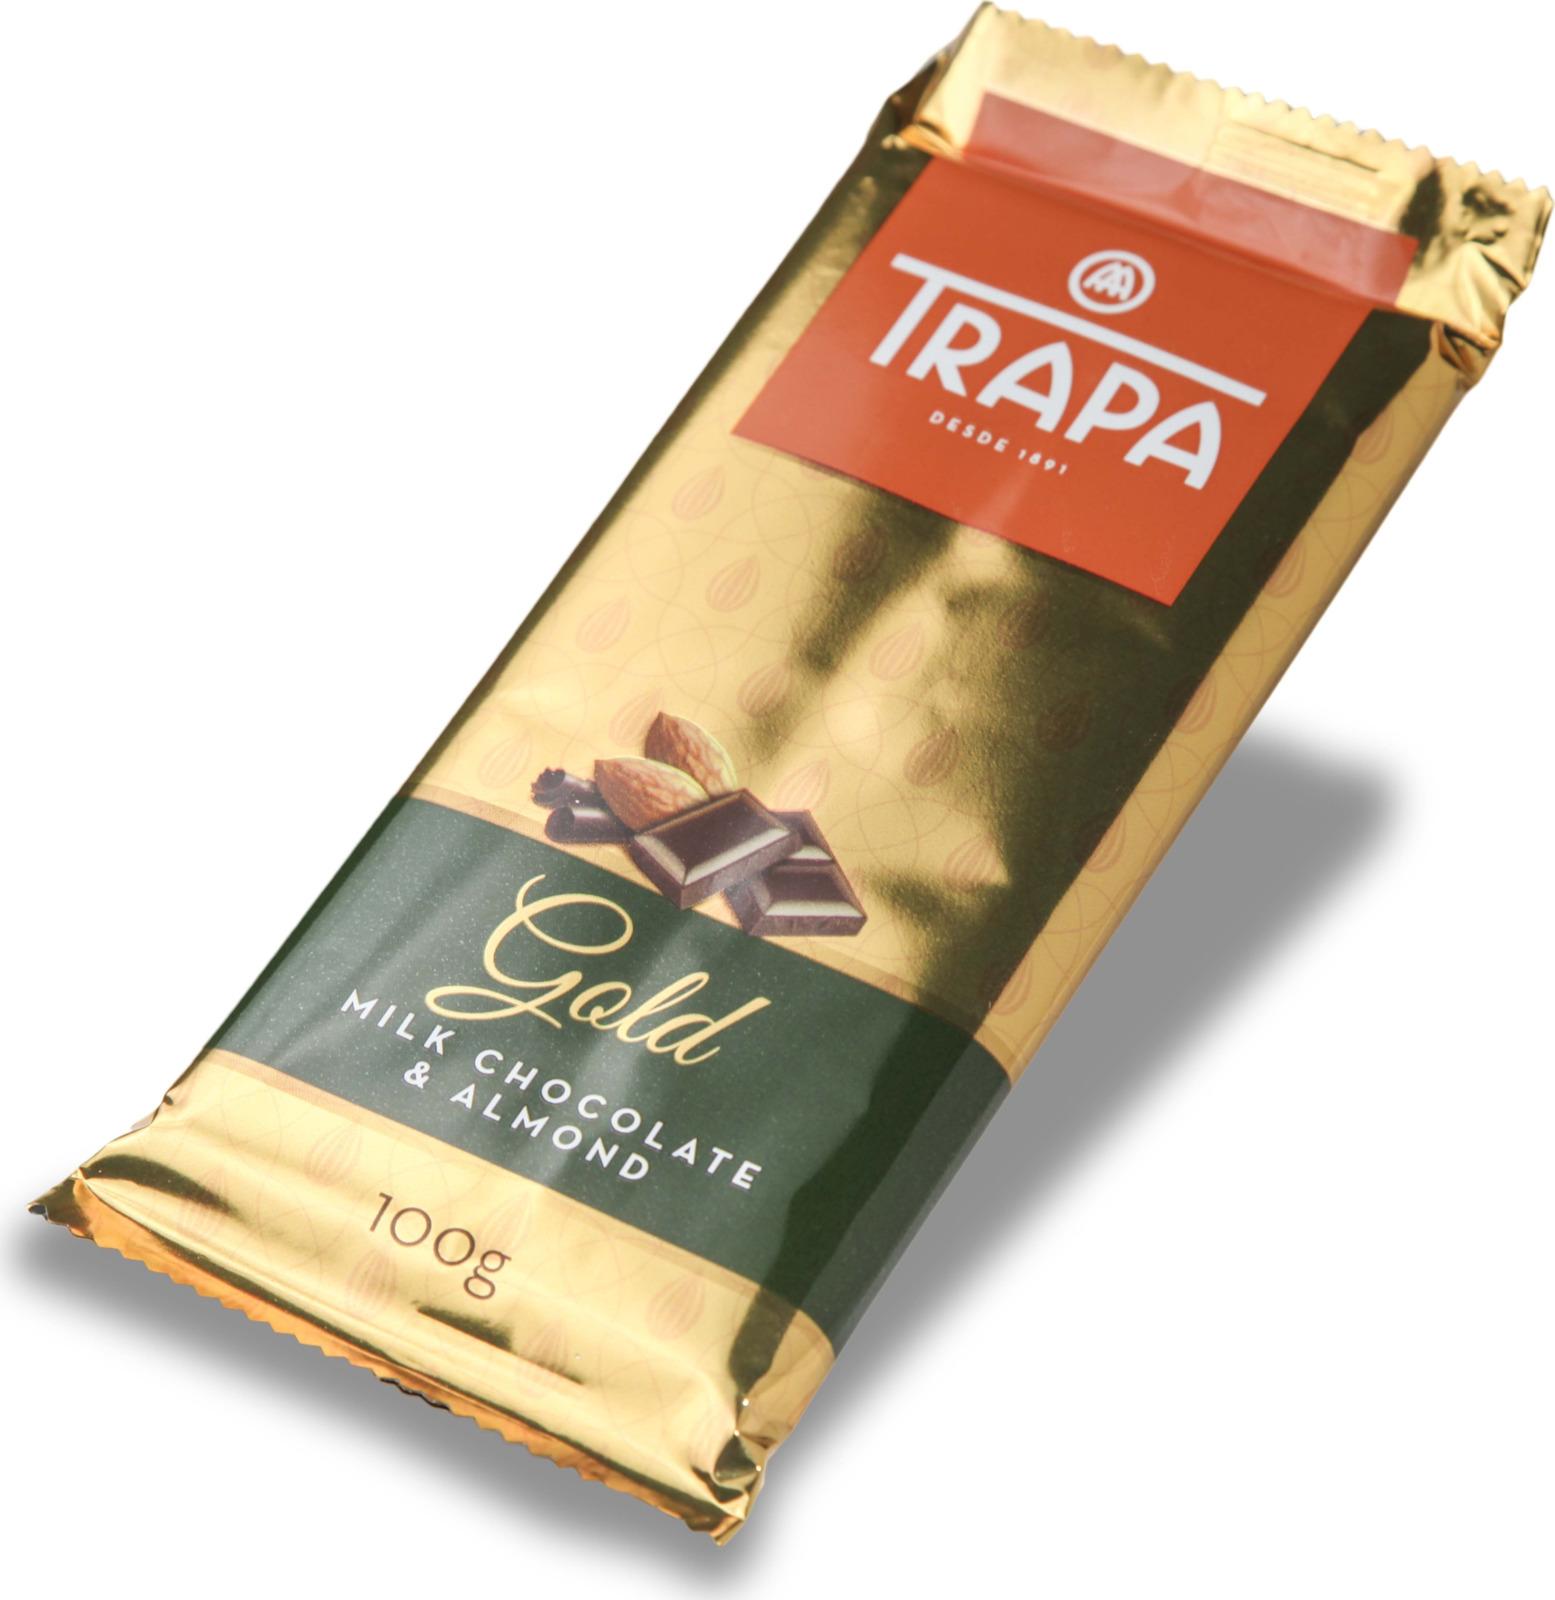 цена Молочный шоколад Trapa Gold Bar, с миндалем, 100 г онлайн в 2017 году